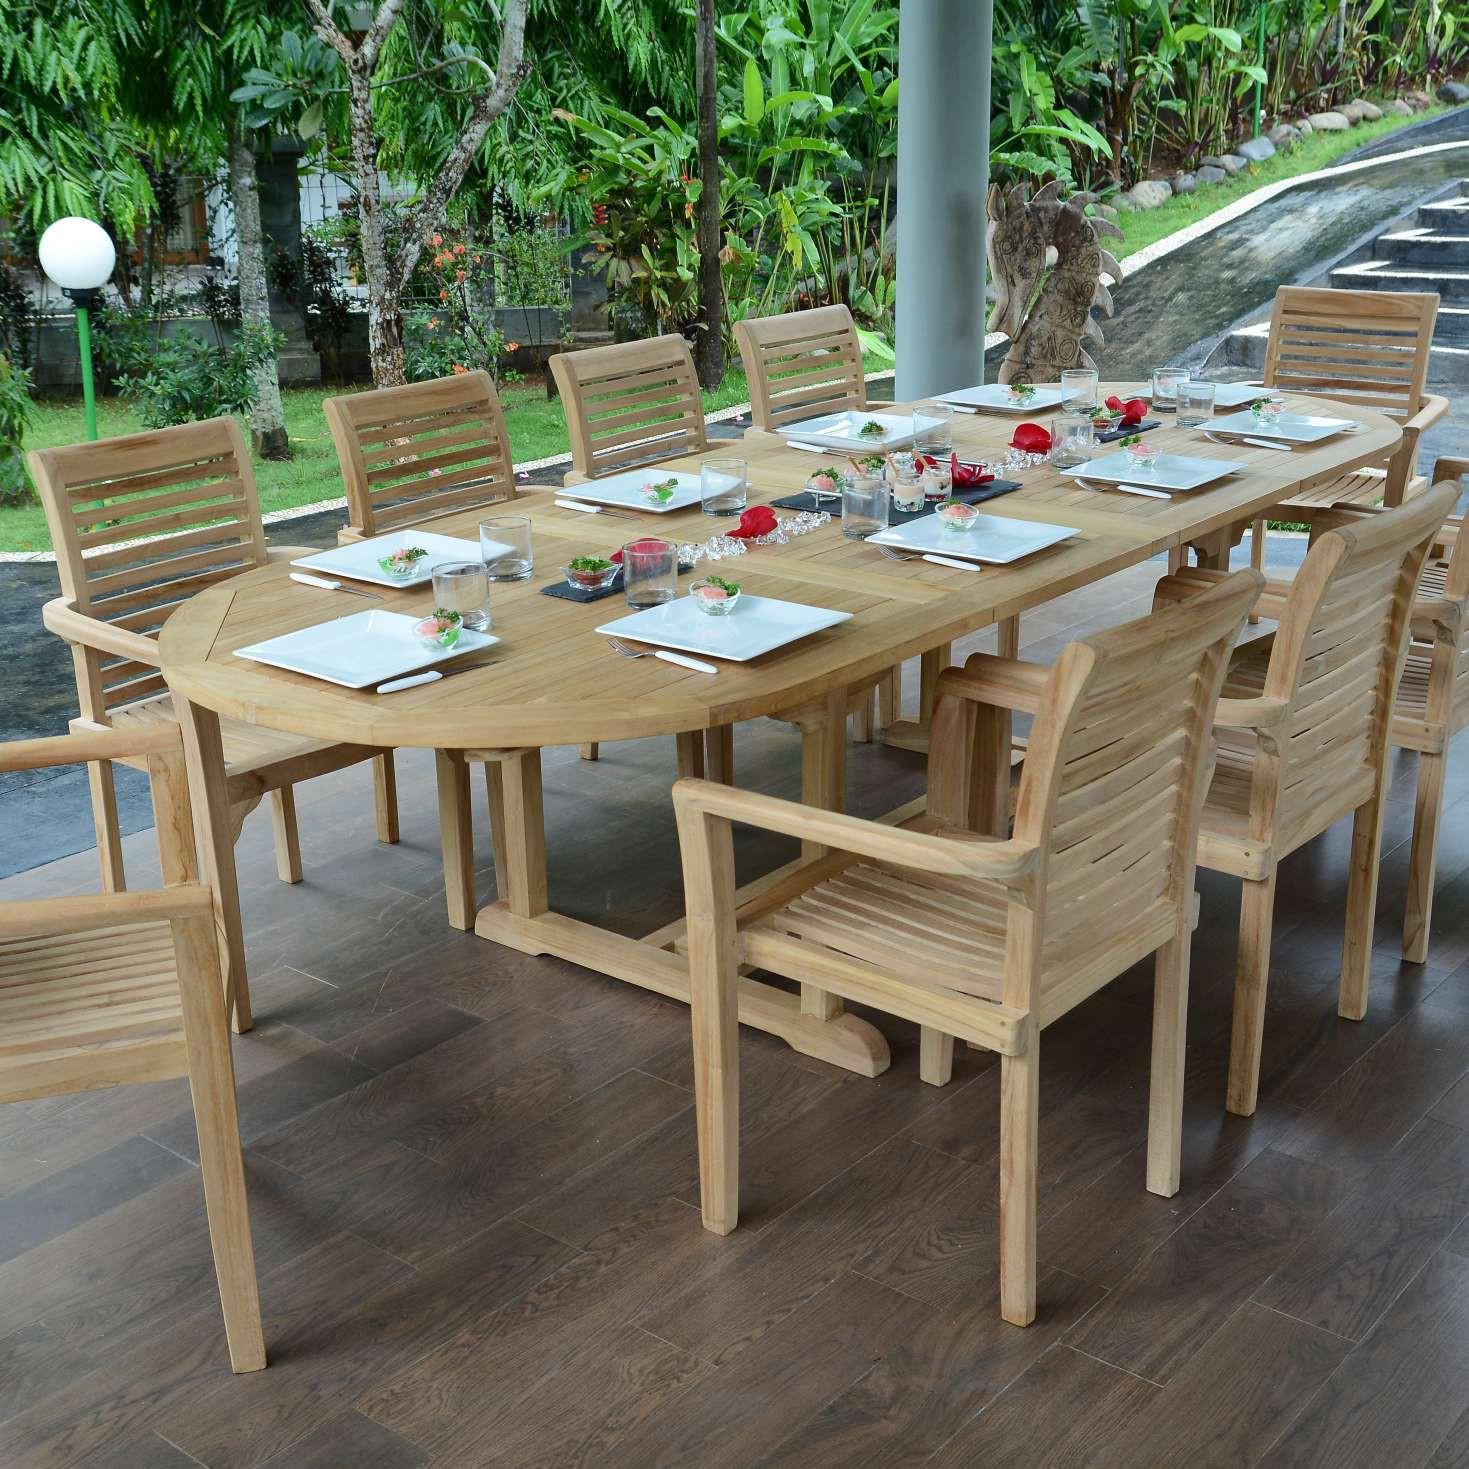 Salon De Jardin Teck Ecograde Venise, 10 Fauteuils concernant Salon De Jardin De Qualité